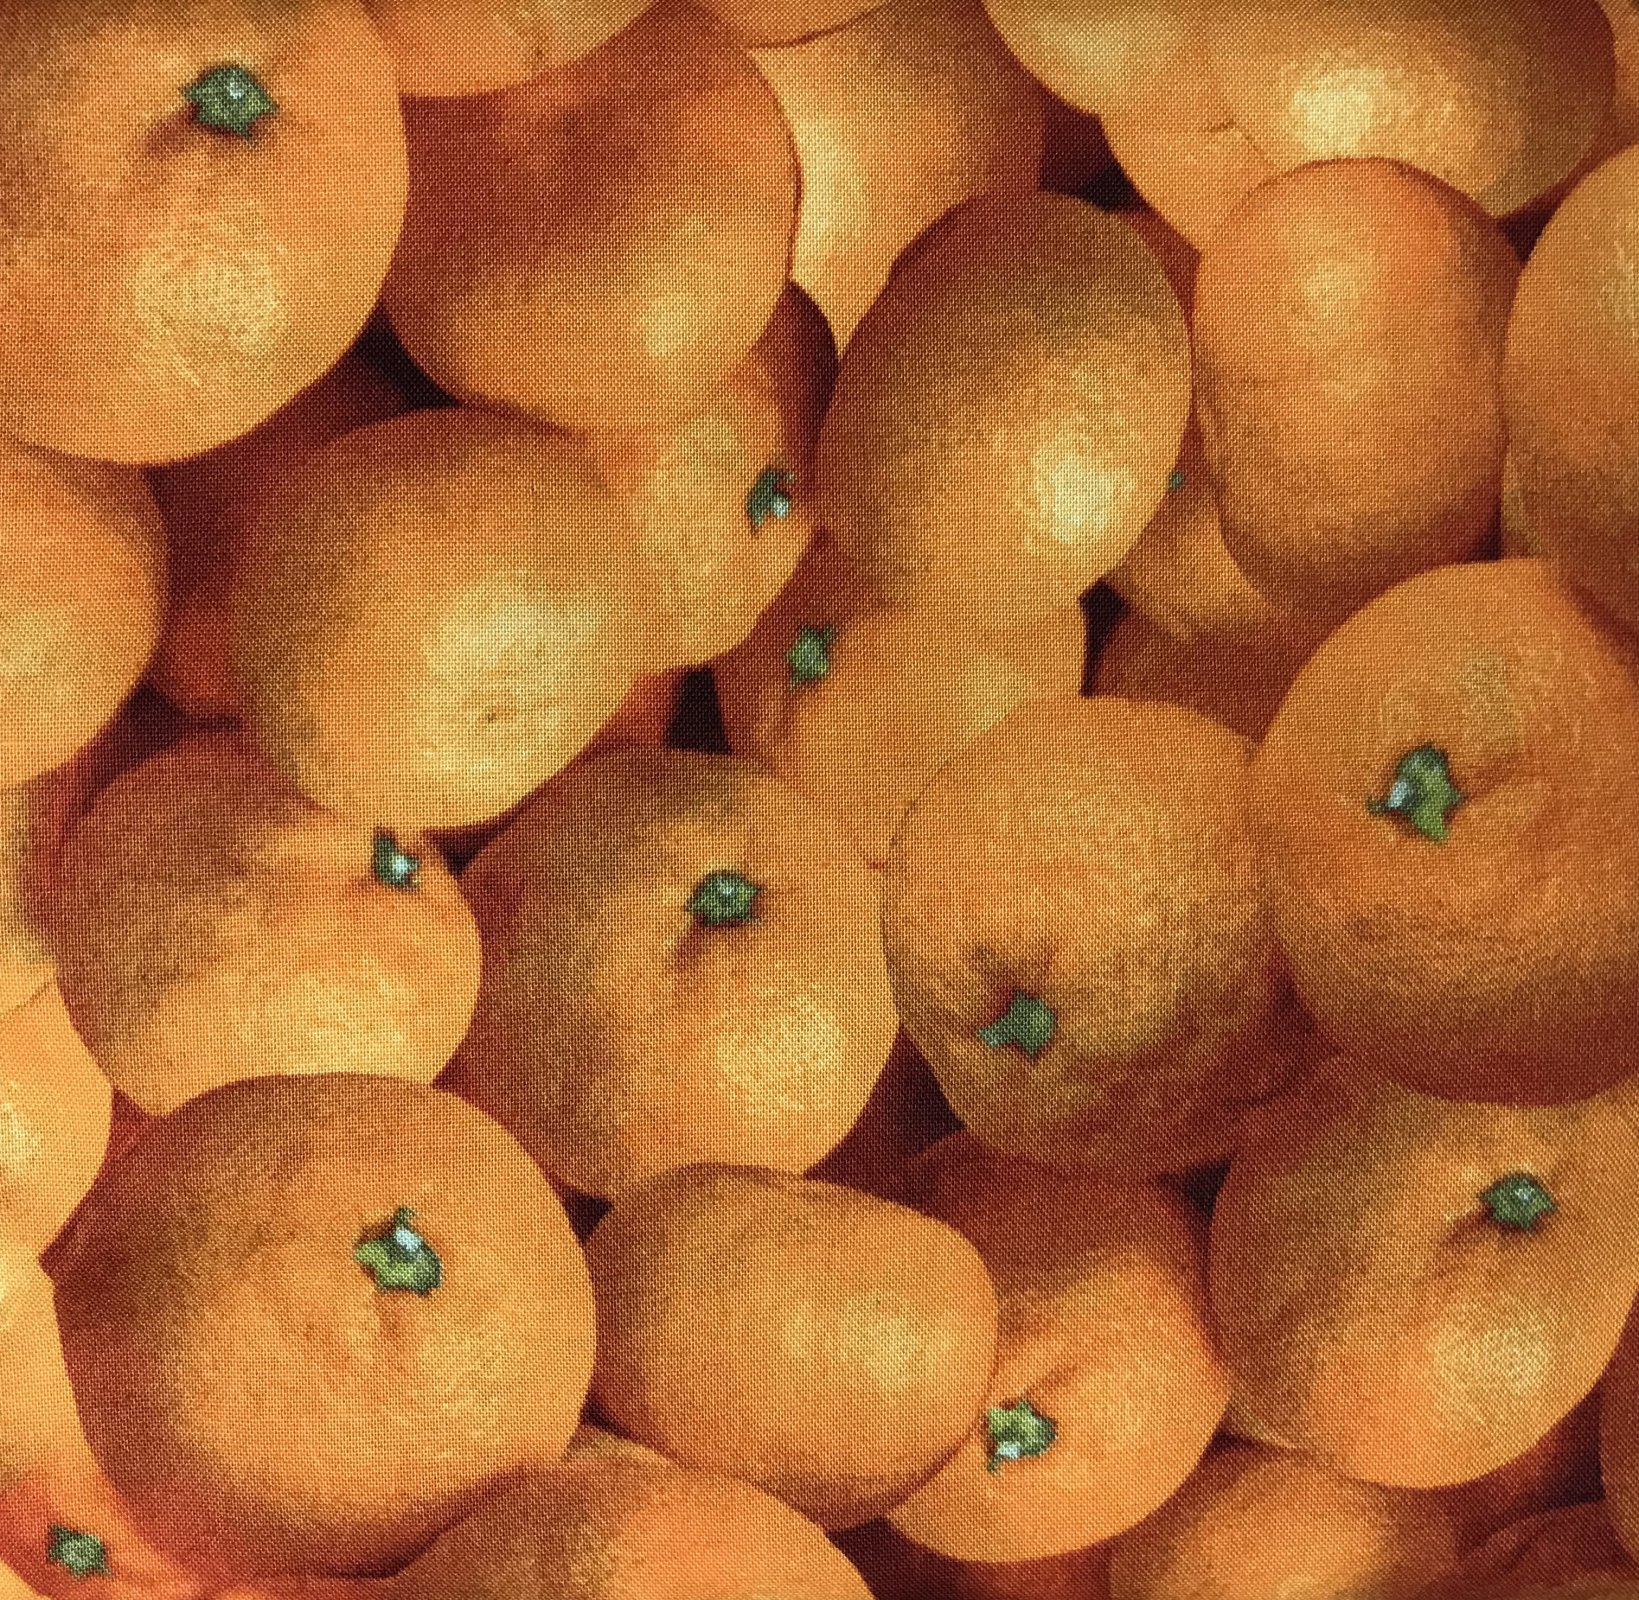 Farmers Market Oranges by RJR Fabrics 0886 ORANGE